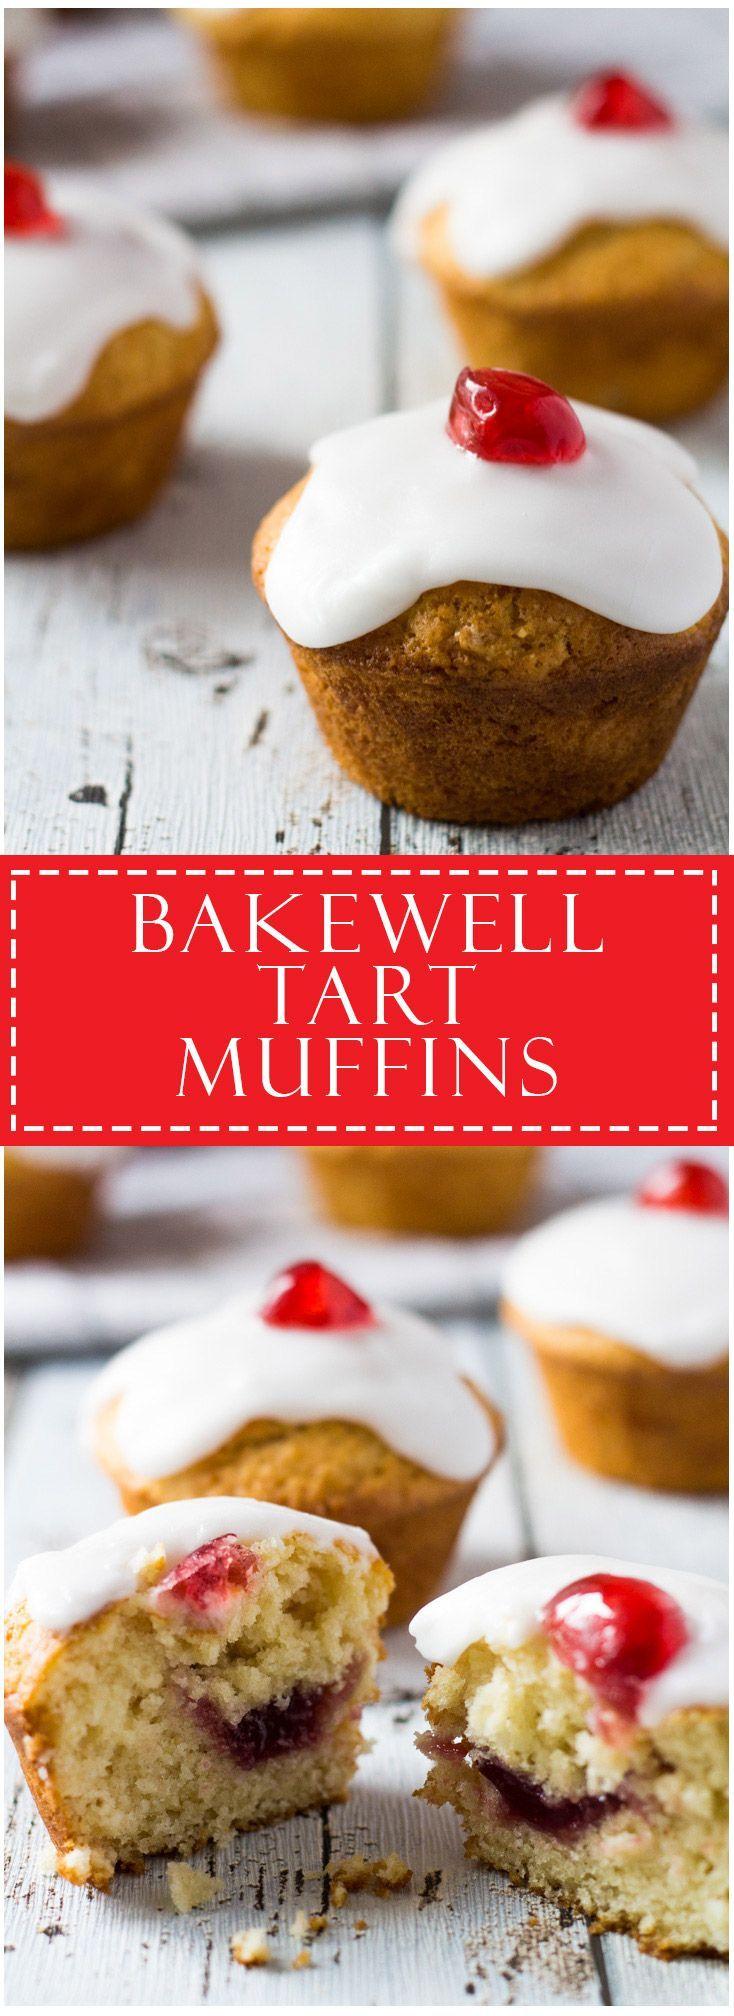 Bakewell Tart Muffins   Marsha's Baking Addiction